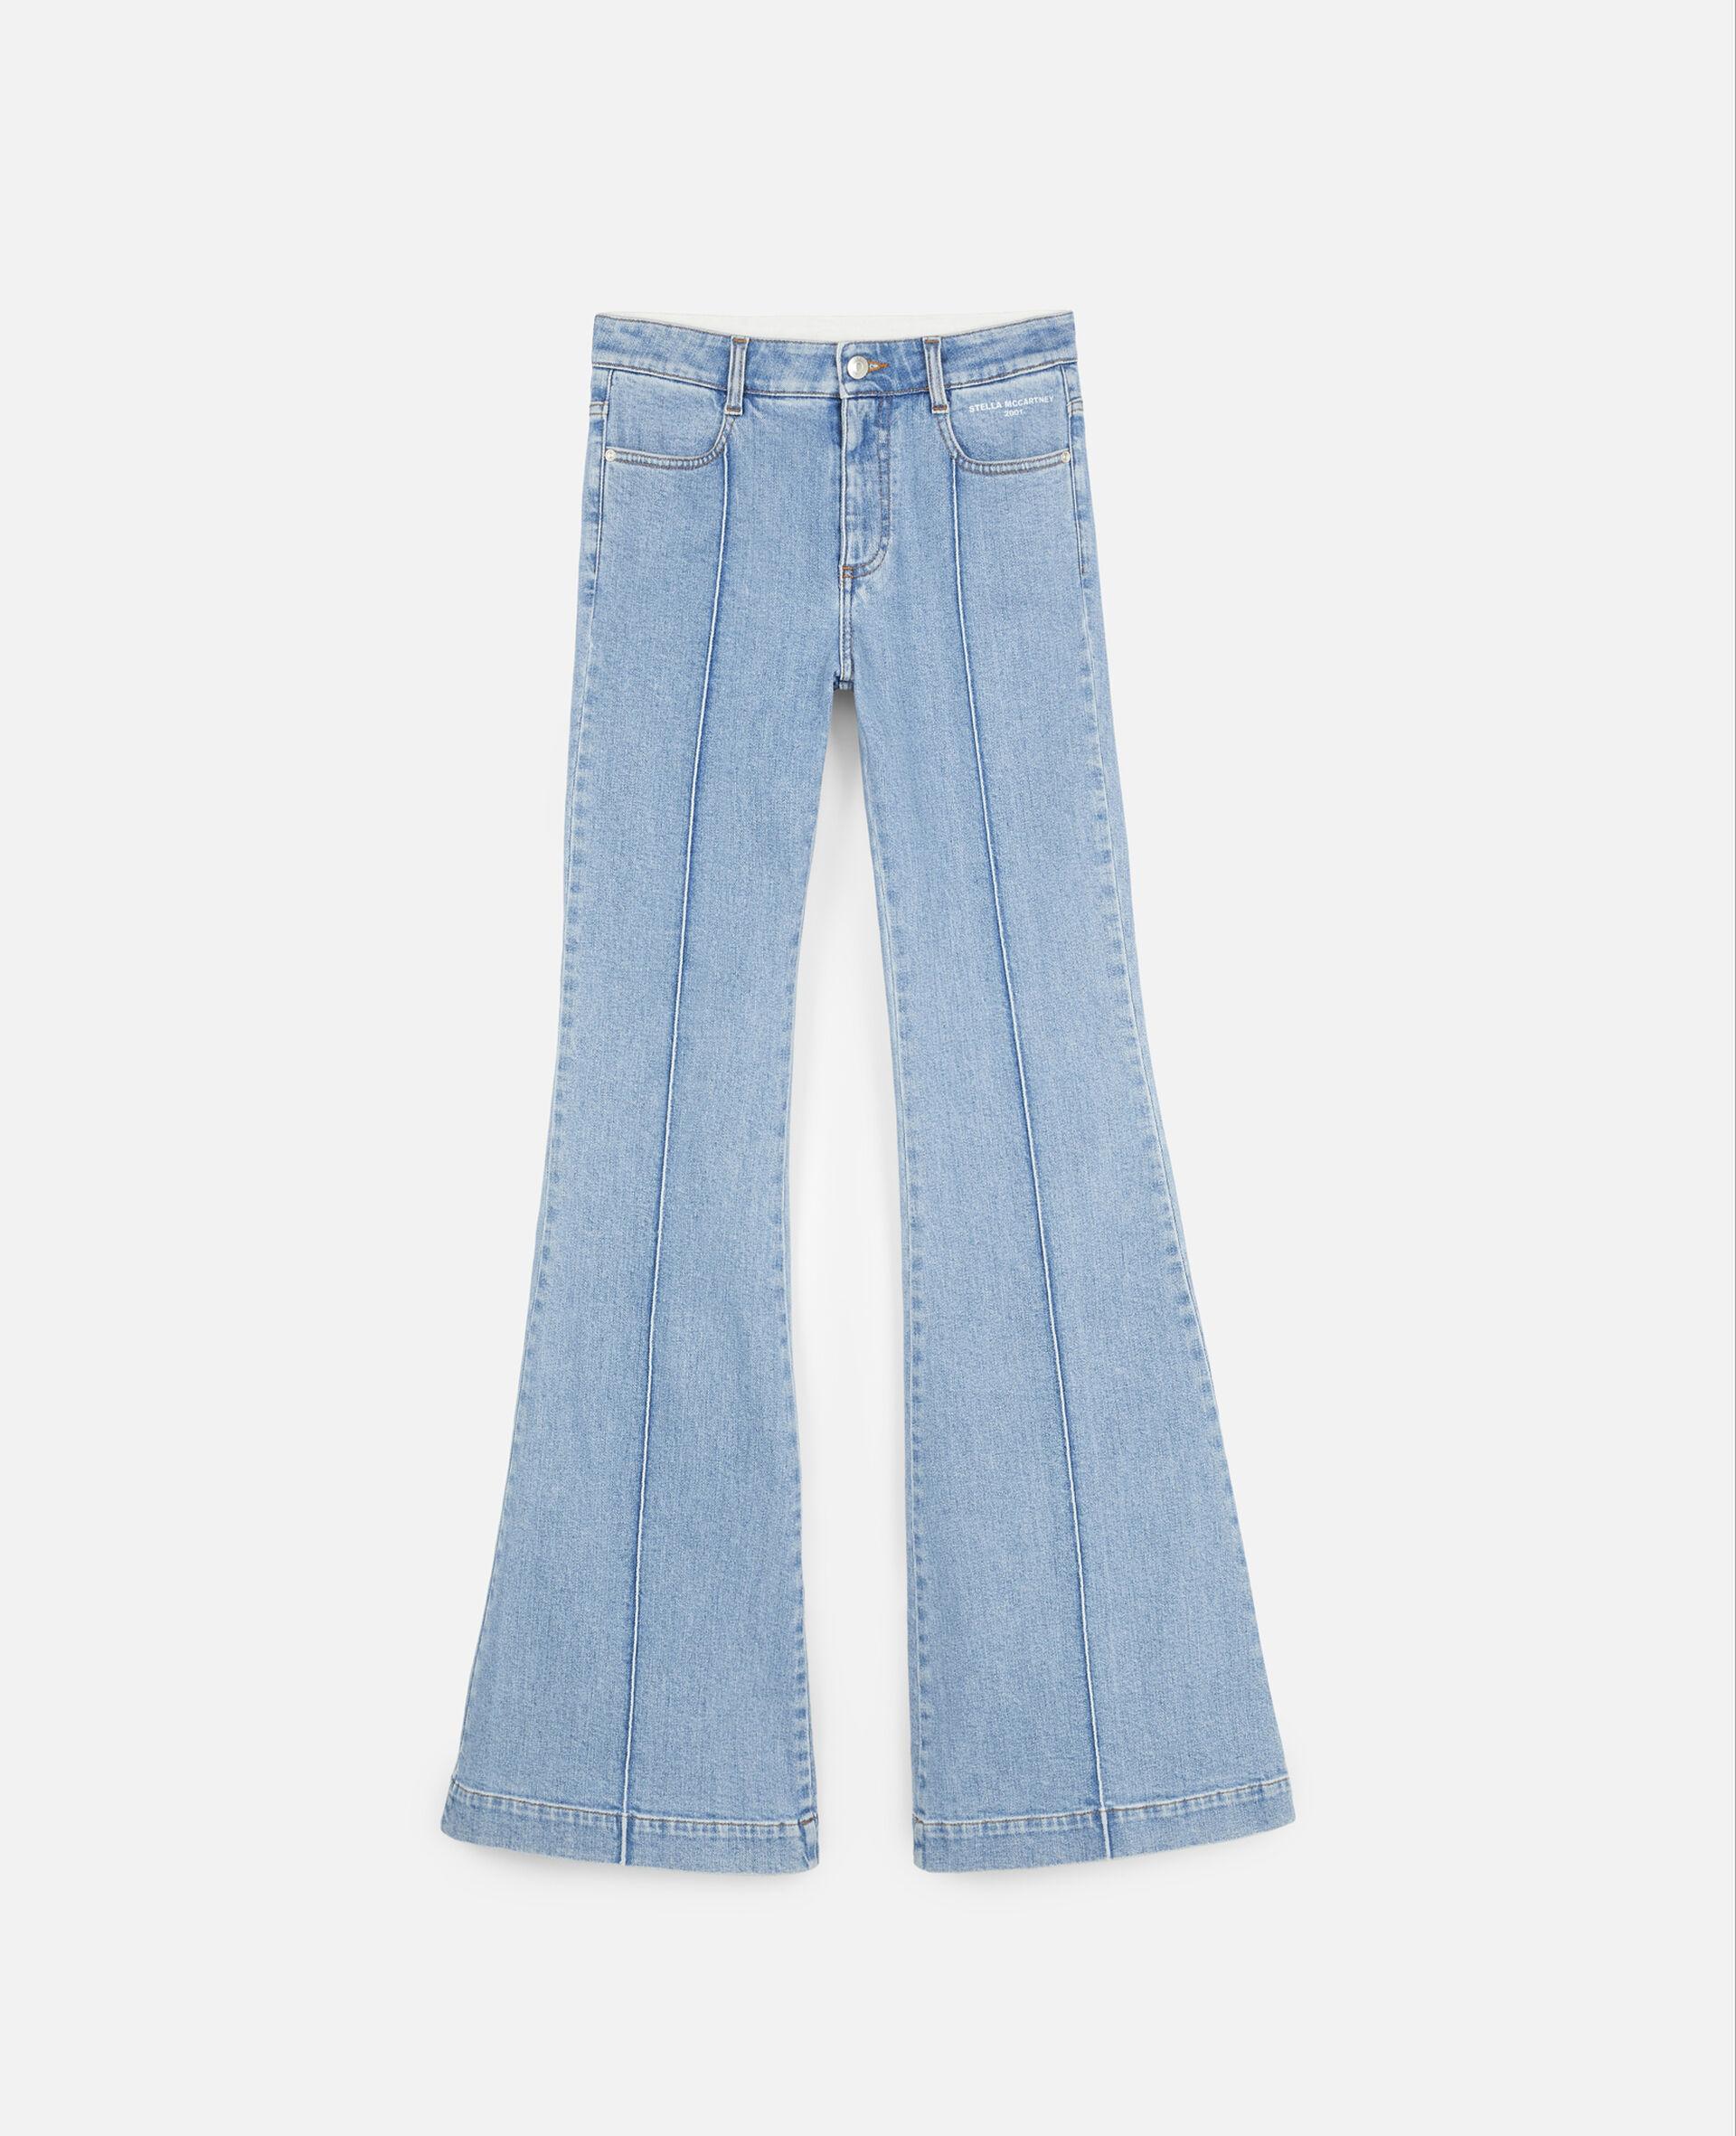 70's 喇叭裤-蓝色-large image number 0